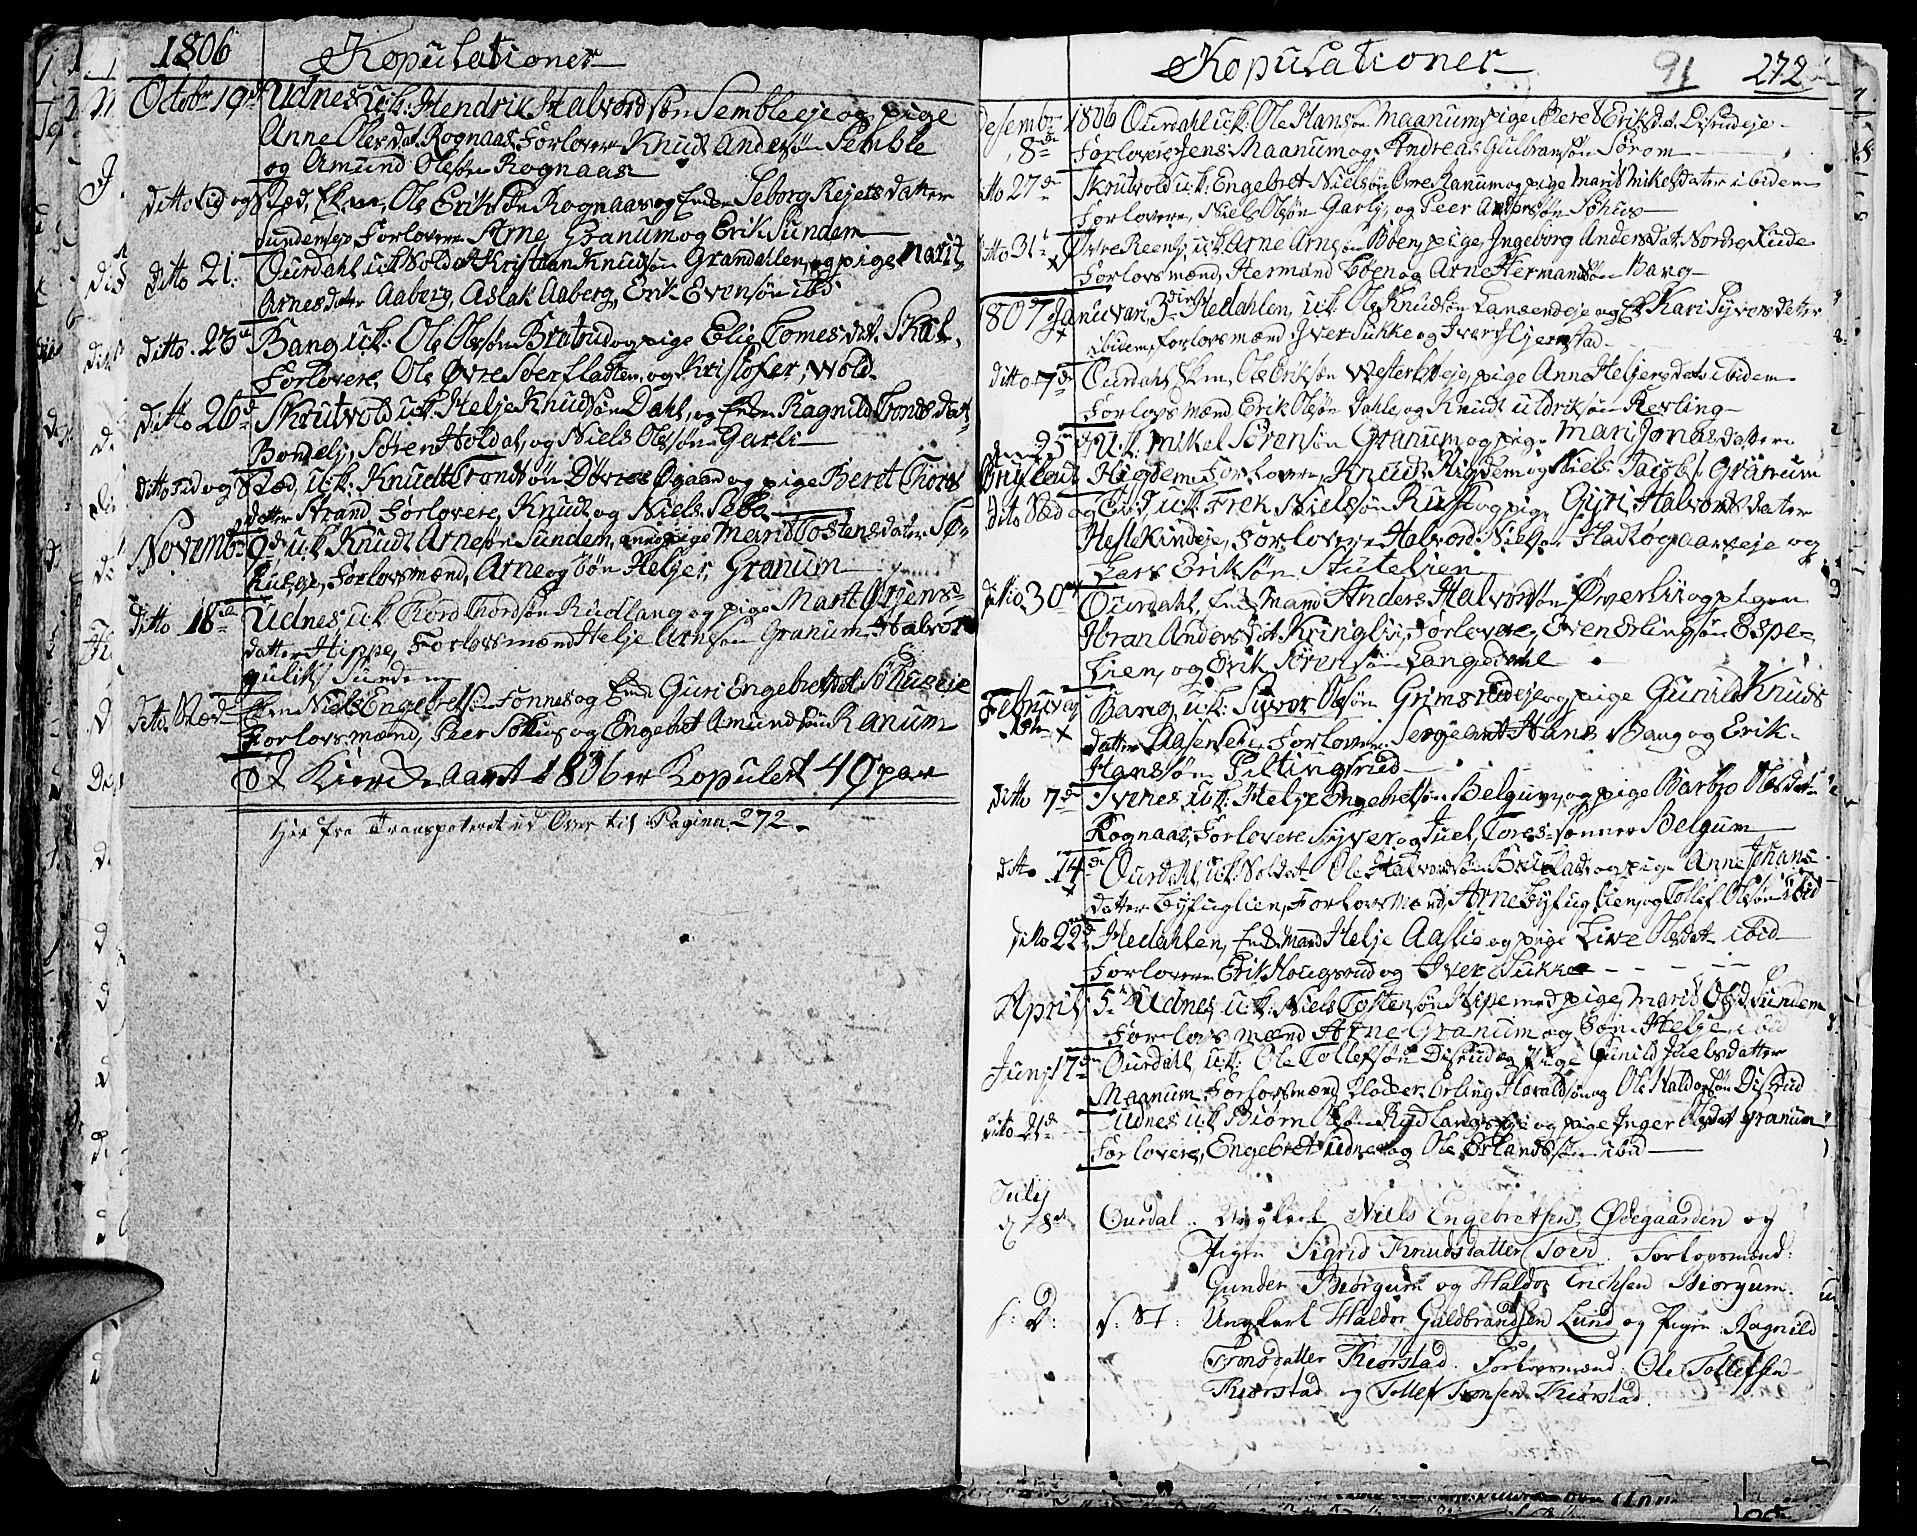 SAH, Aurdal prestekontor, Ministerialbok nr. 7, 1800-1808, s. 91